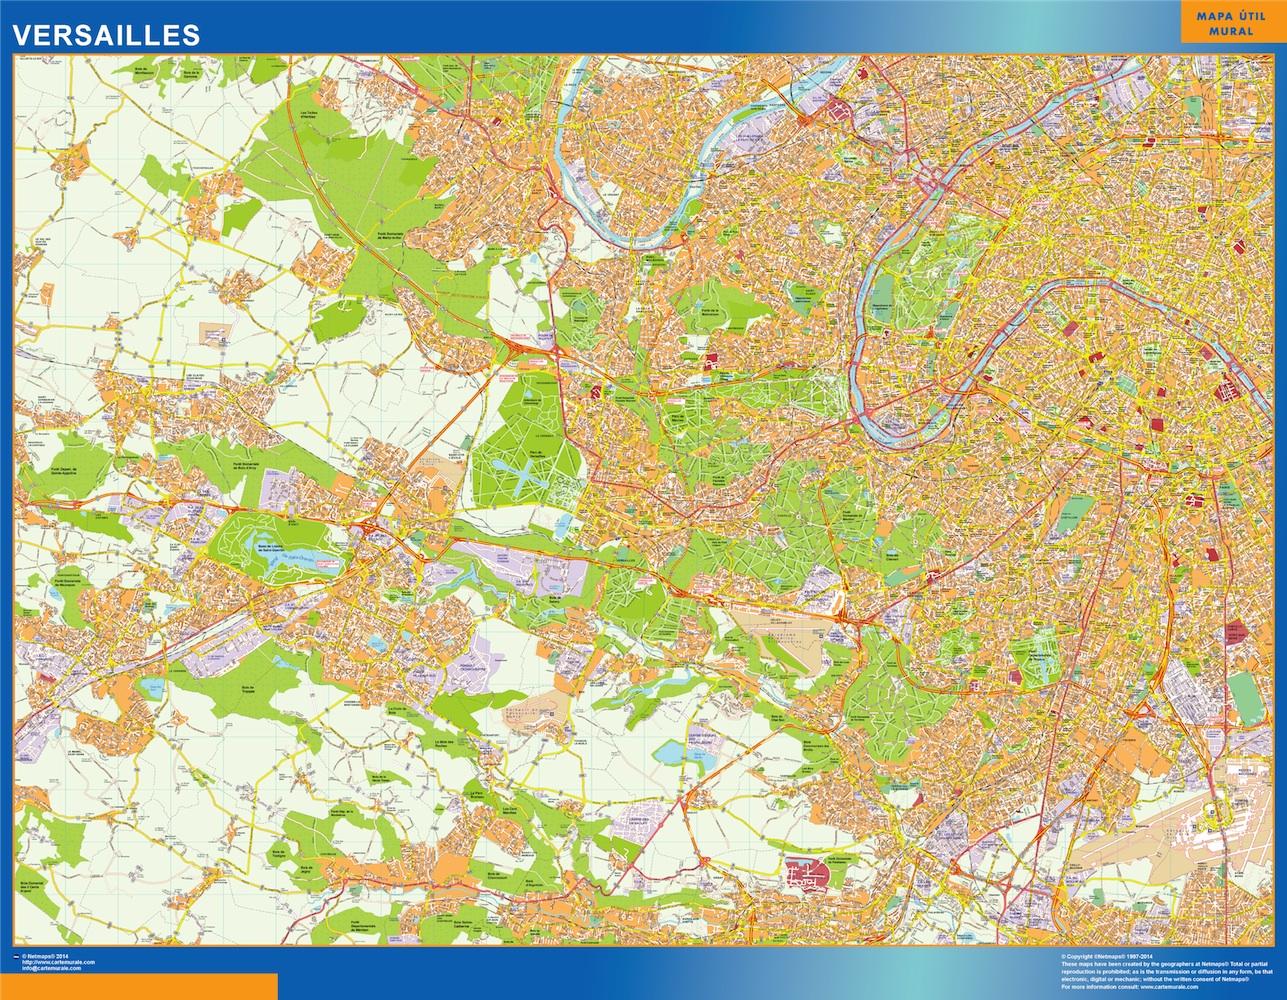 versailles map